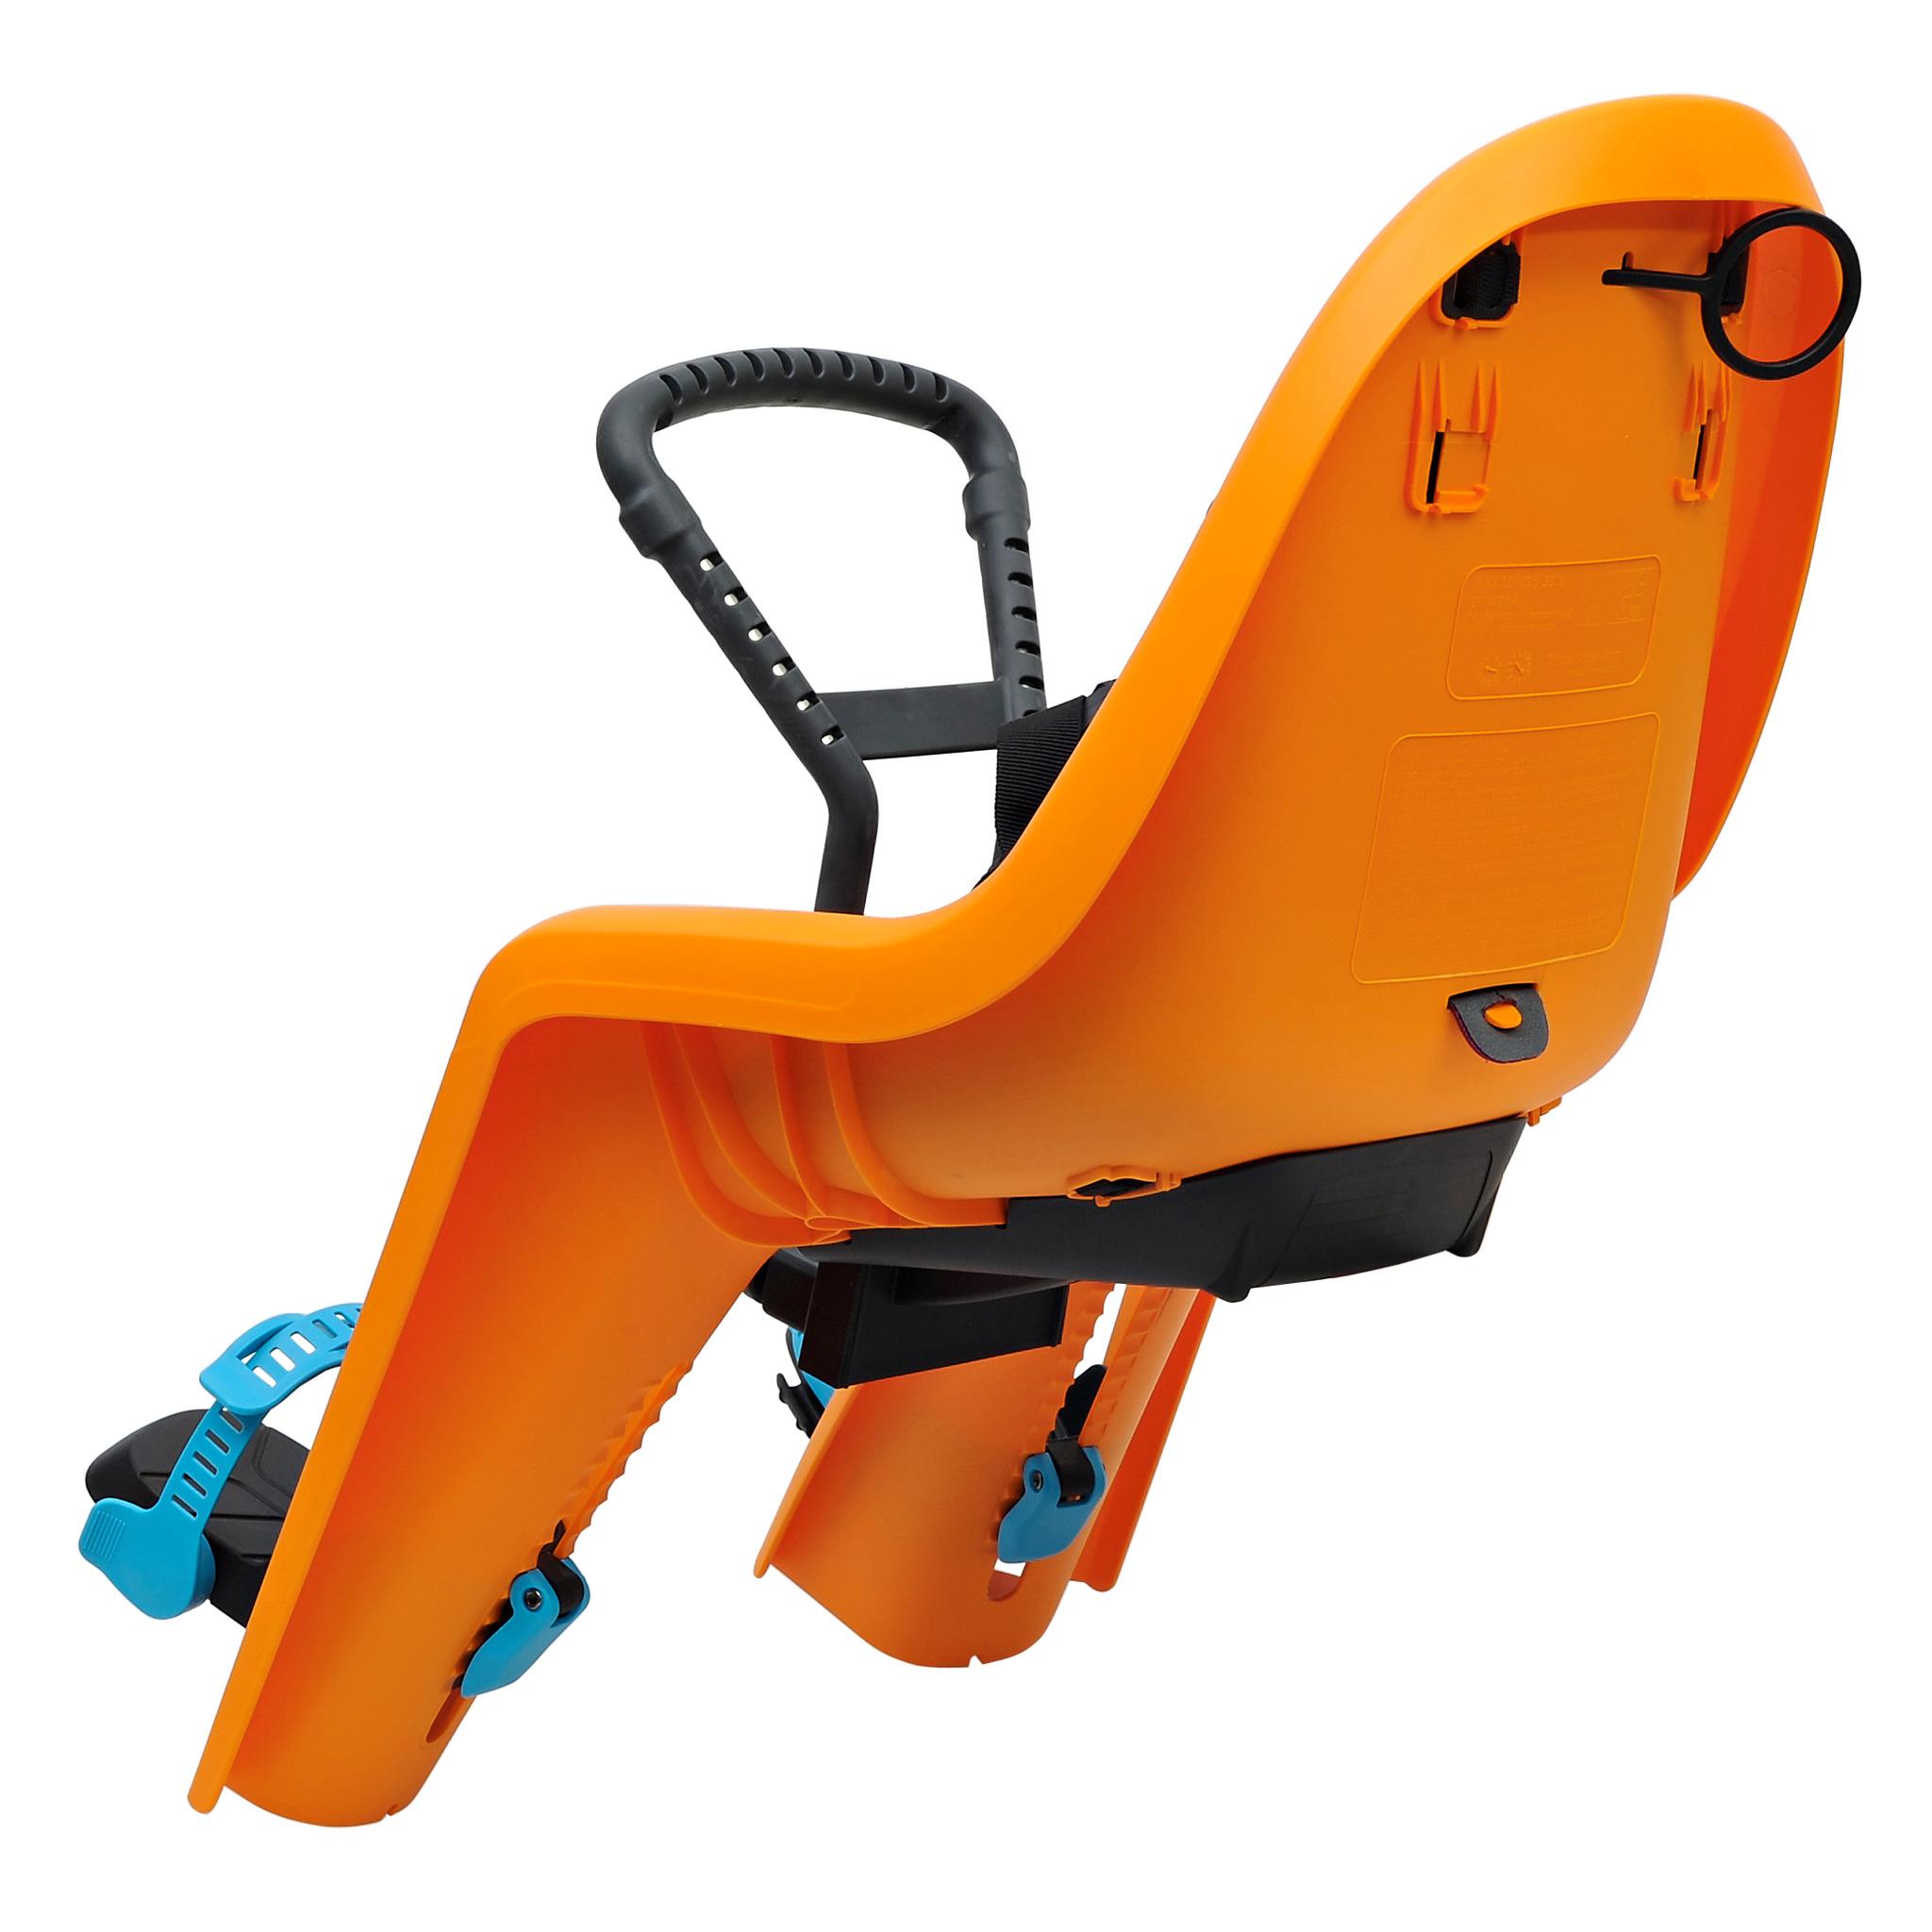 si ge porte b b thule ride along mini fixation avant orange probikeshop. Black Bedroom Furniture Sets. Home Design Ideas